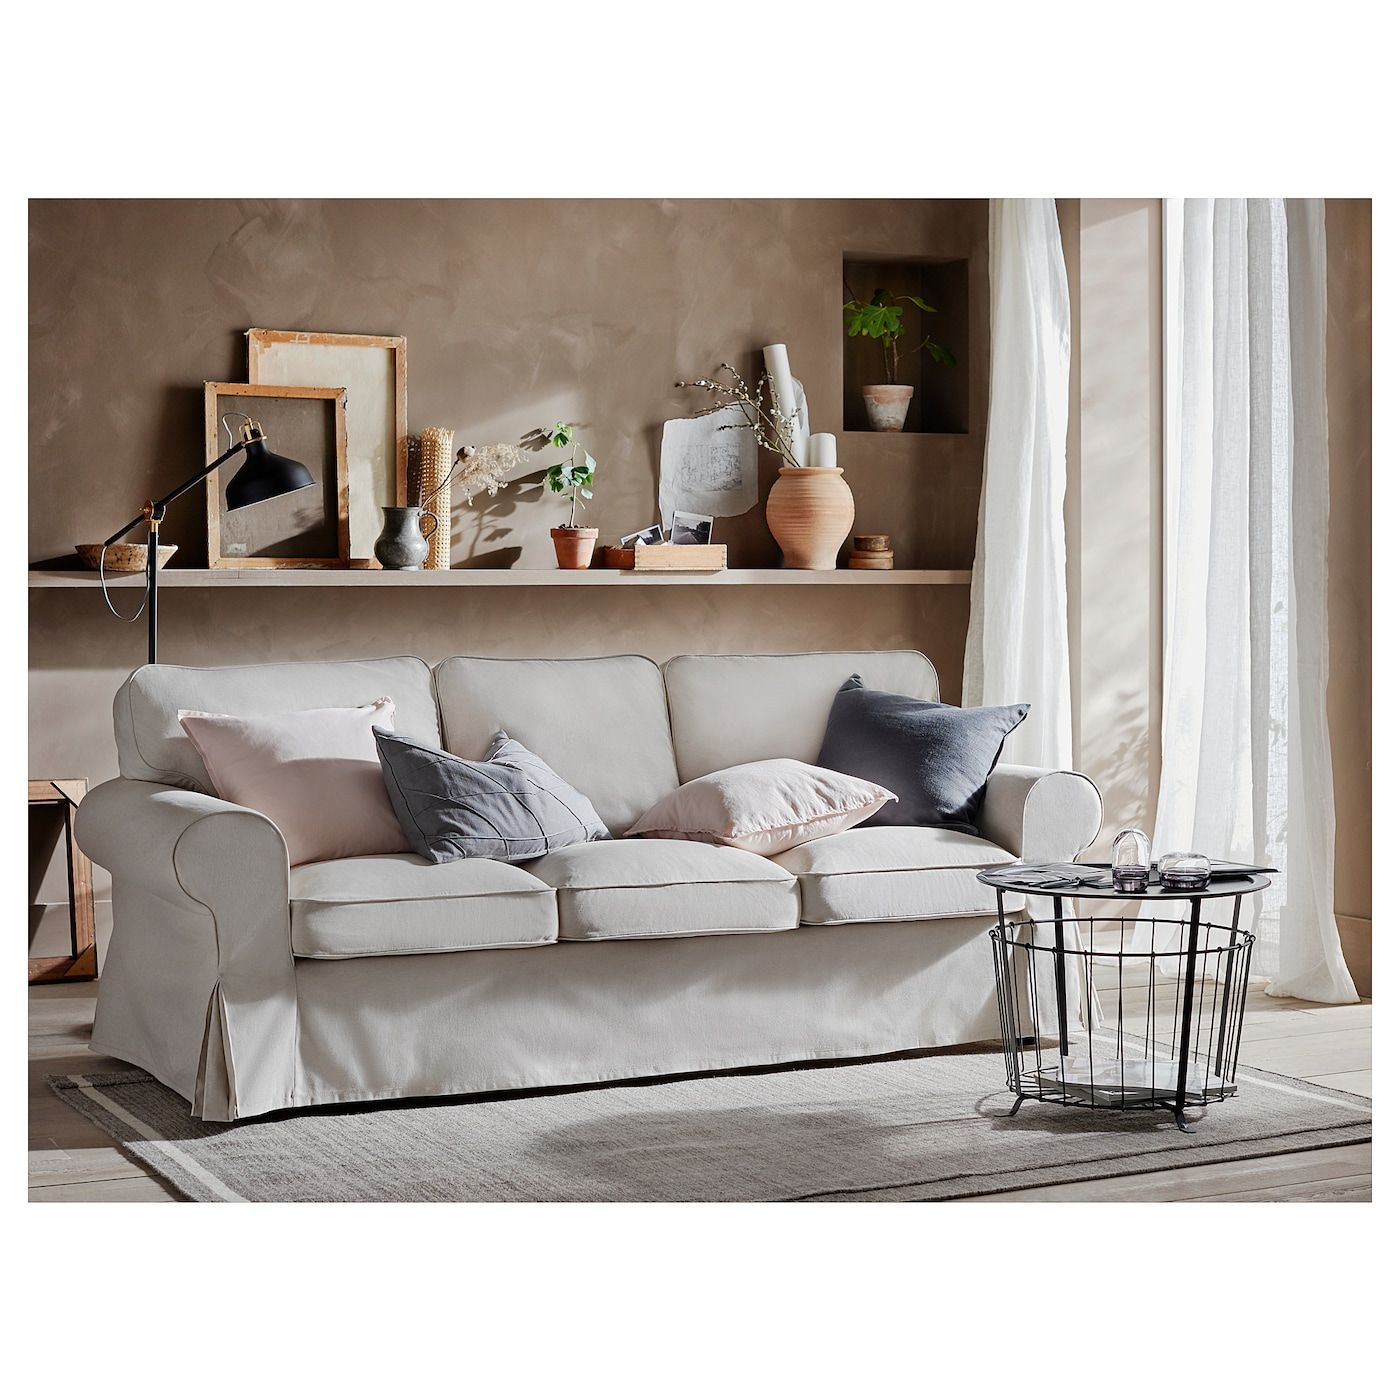 Ektorp 3er Sofa Lofallet Beige Ikea Osterreich In 2020 Ektorp Sofa Ikea Ektorp Sofa Beige Living Rooms